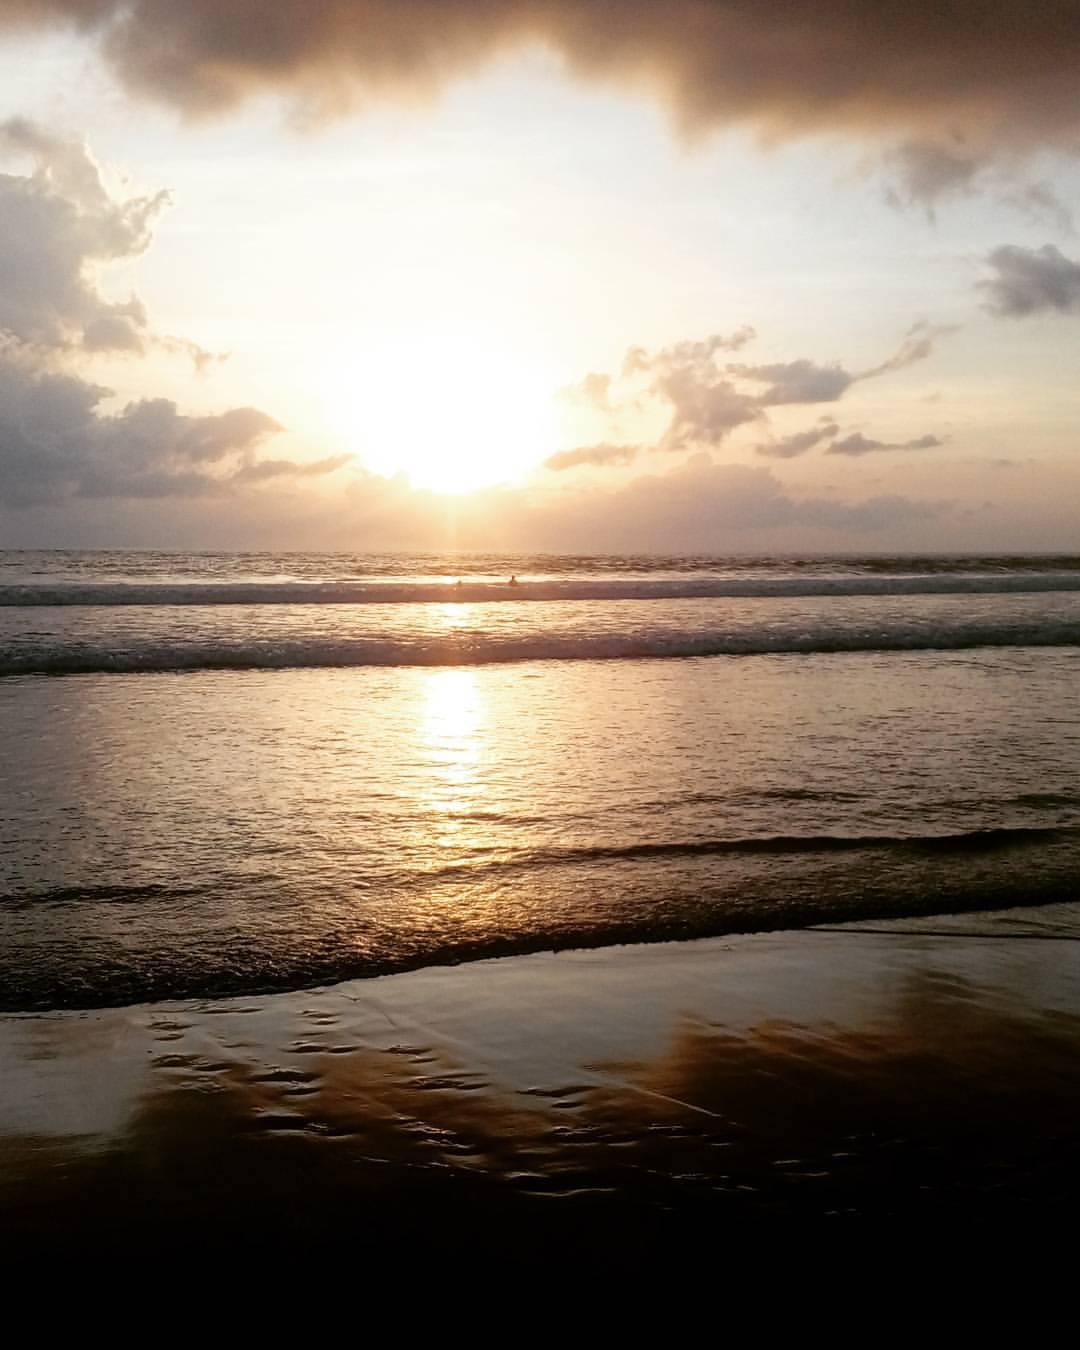 Double_Six_Beach_Sunset_Bali.jpg